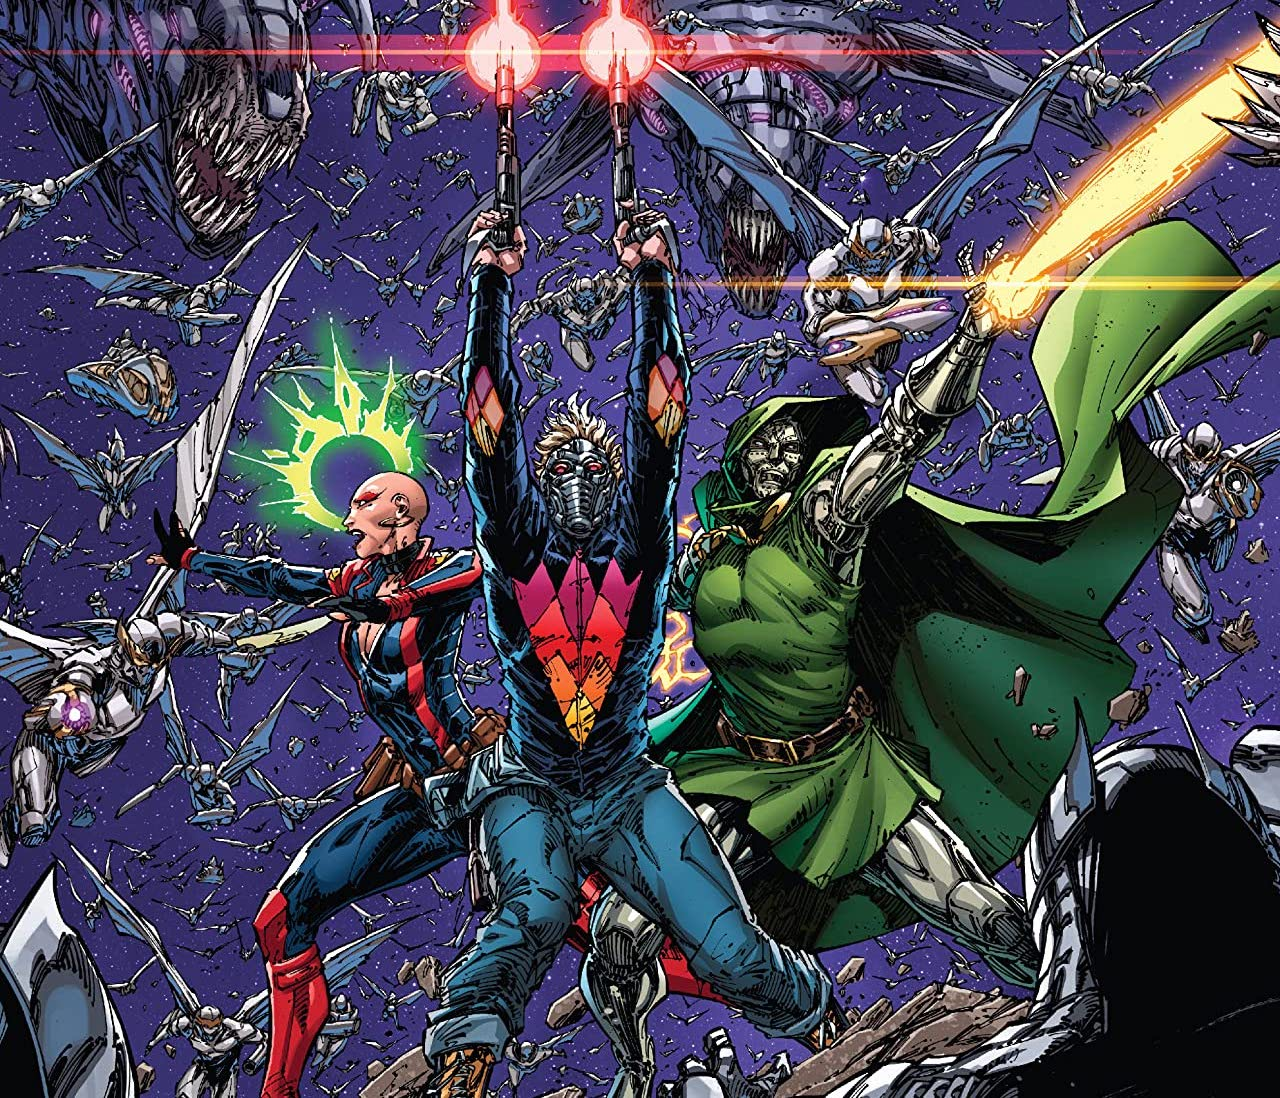 'Guardians of the Galaxy' #17 reveals Doctor Doom's plan